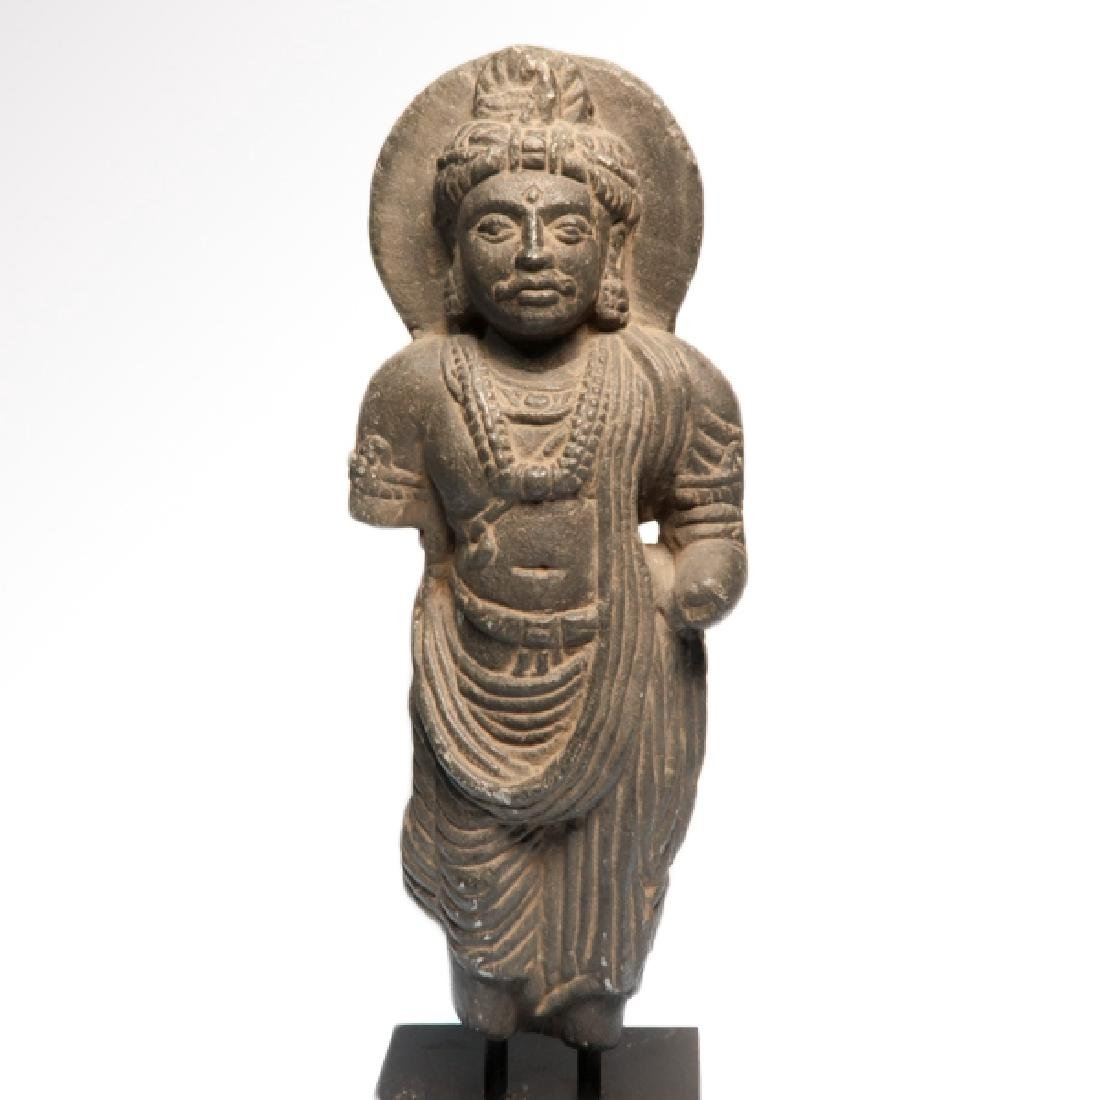 Gandhara Schist Figure of a Standing Buddha, c. 2nd-3rd - 2